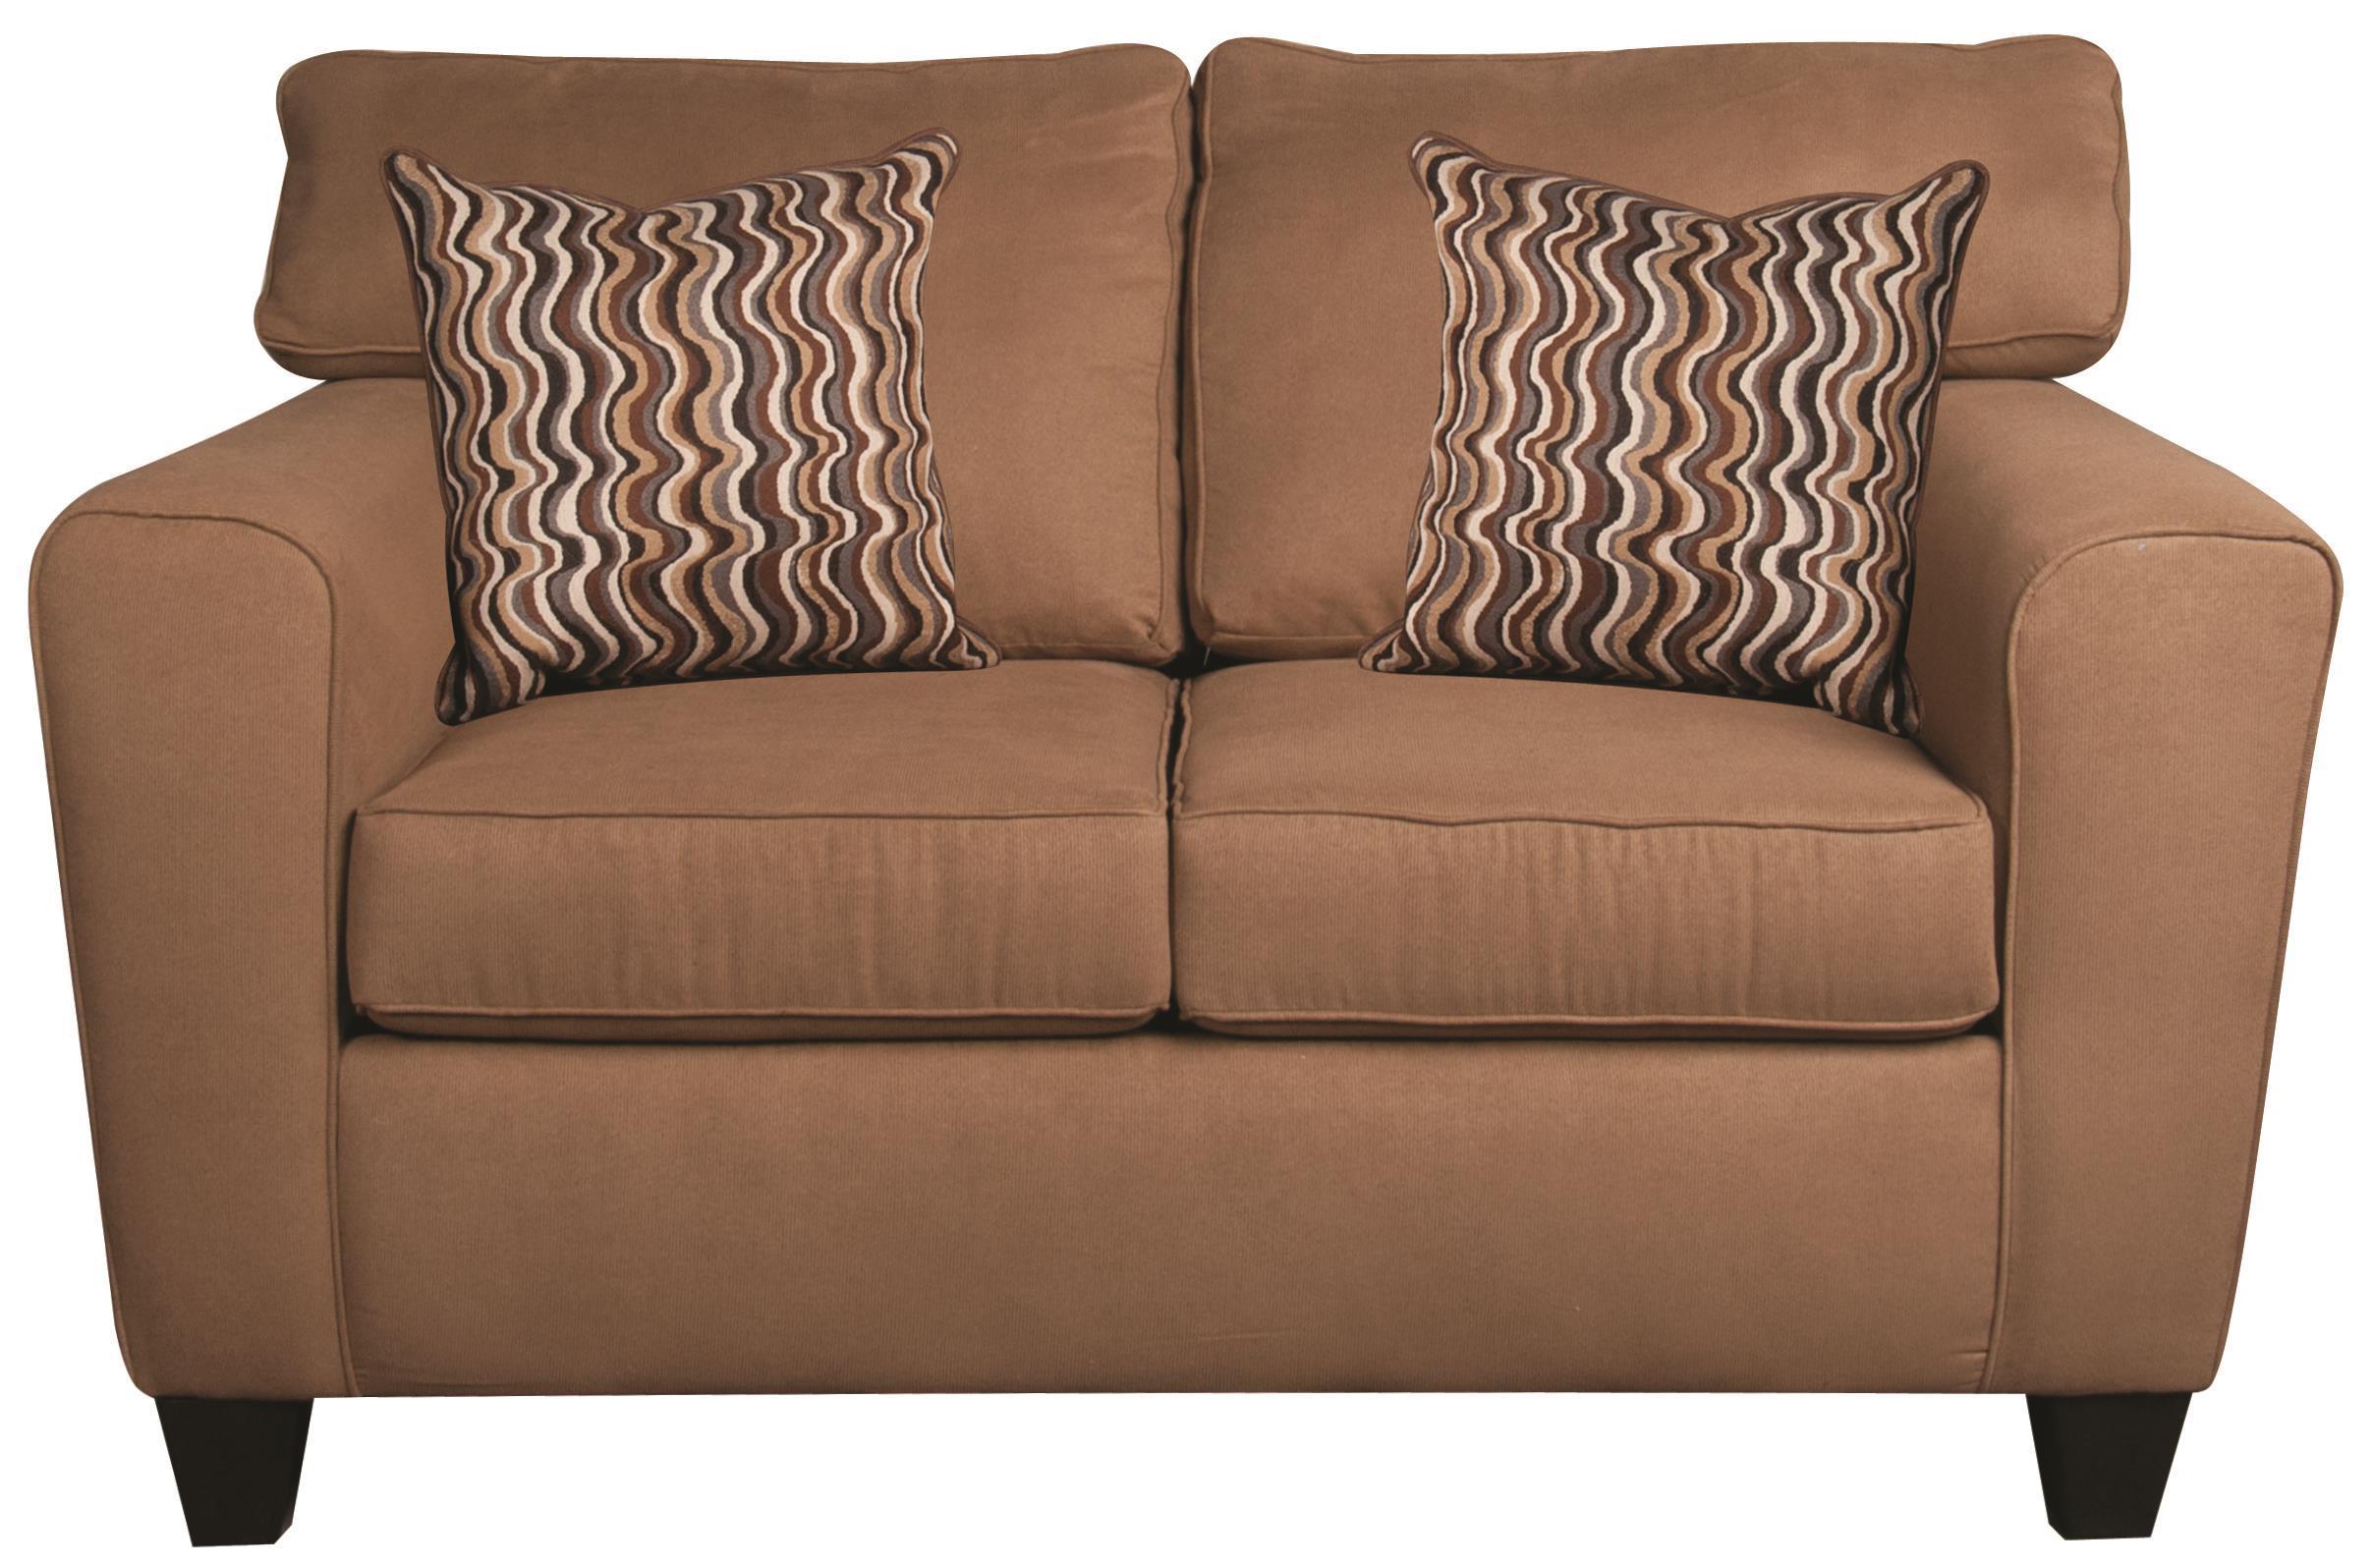 Morris Home Furnishings Chaz Chaz Loveseat - Item Number: 104821257